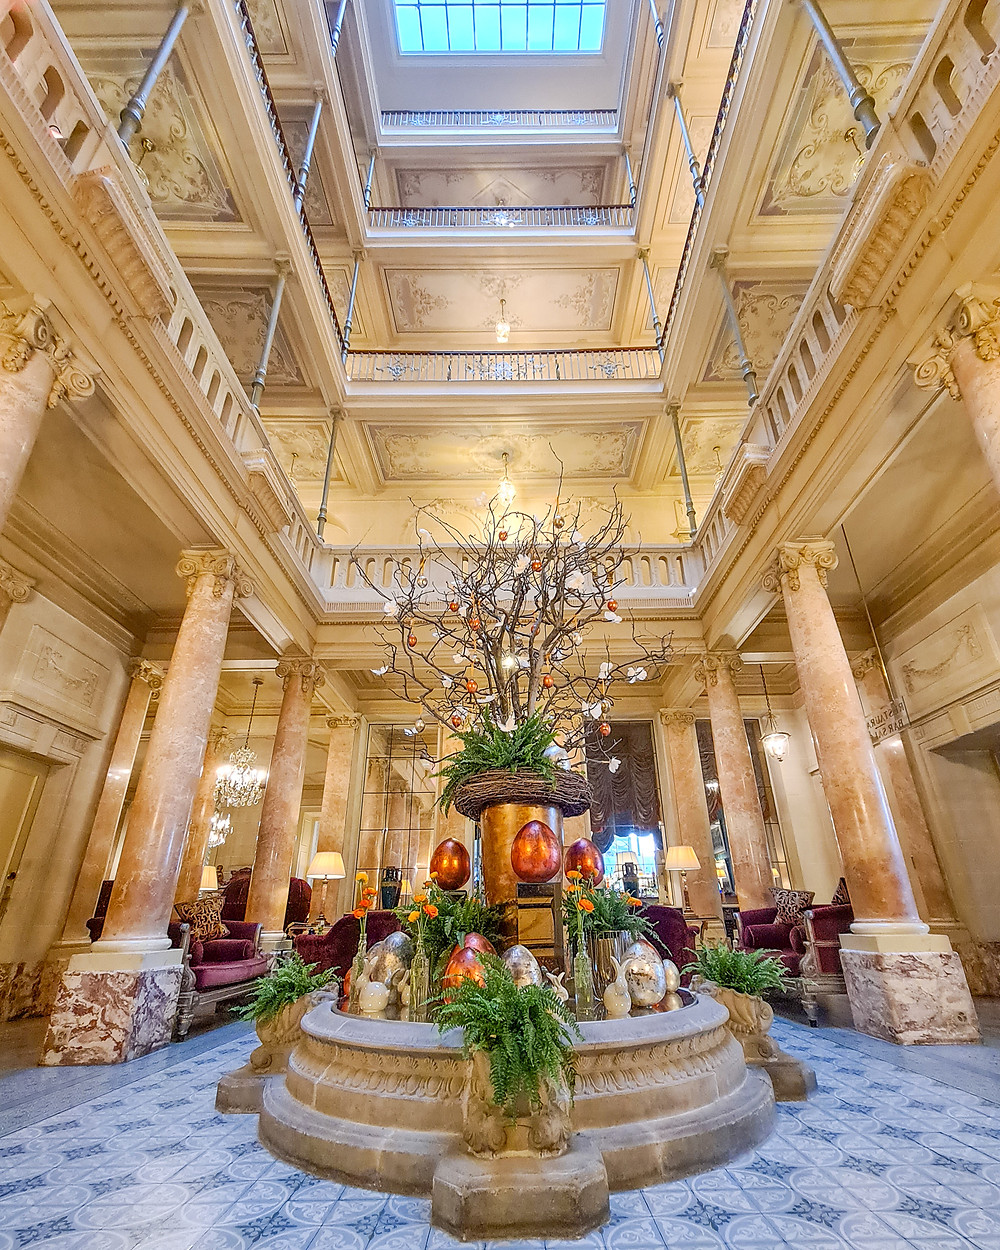 Hôtel Beau-Rivage Geneva Family Blog Review